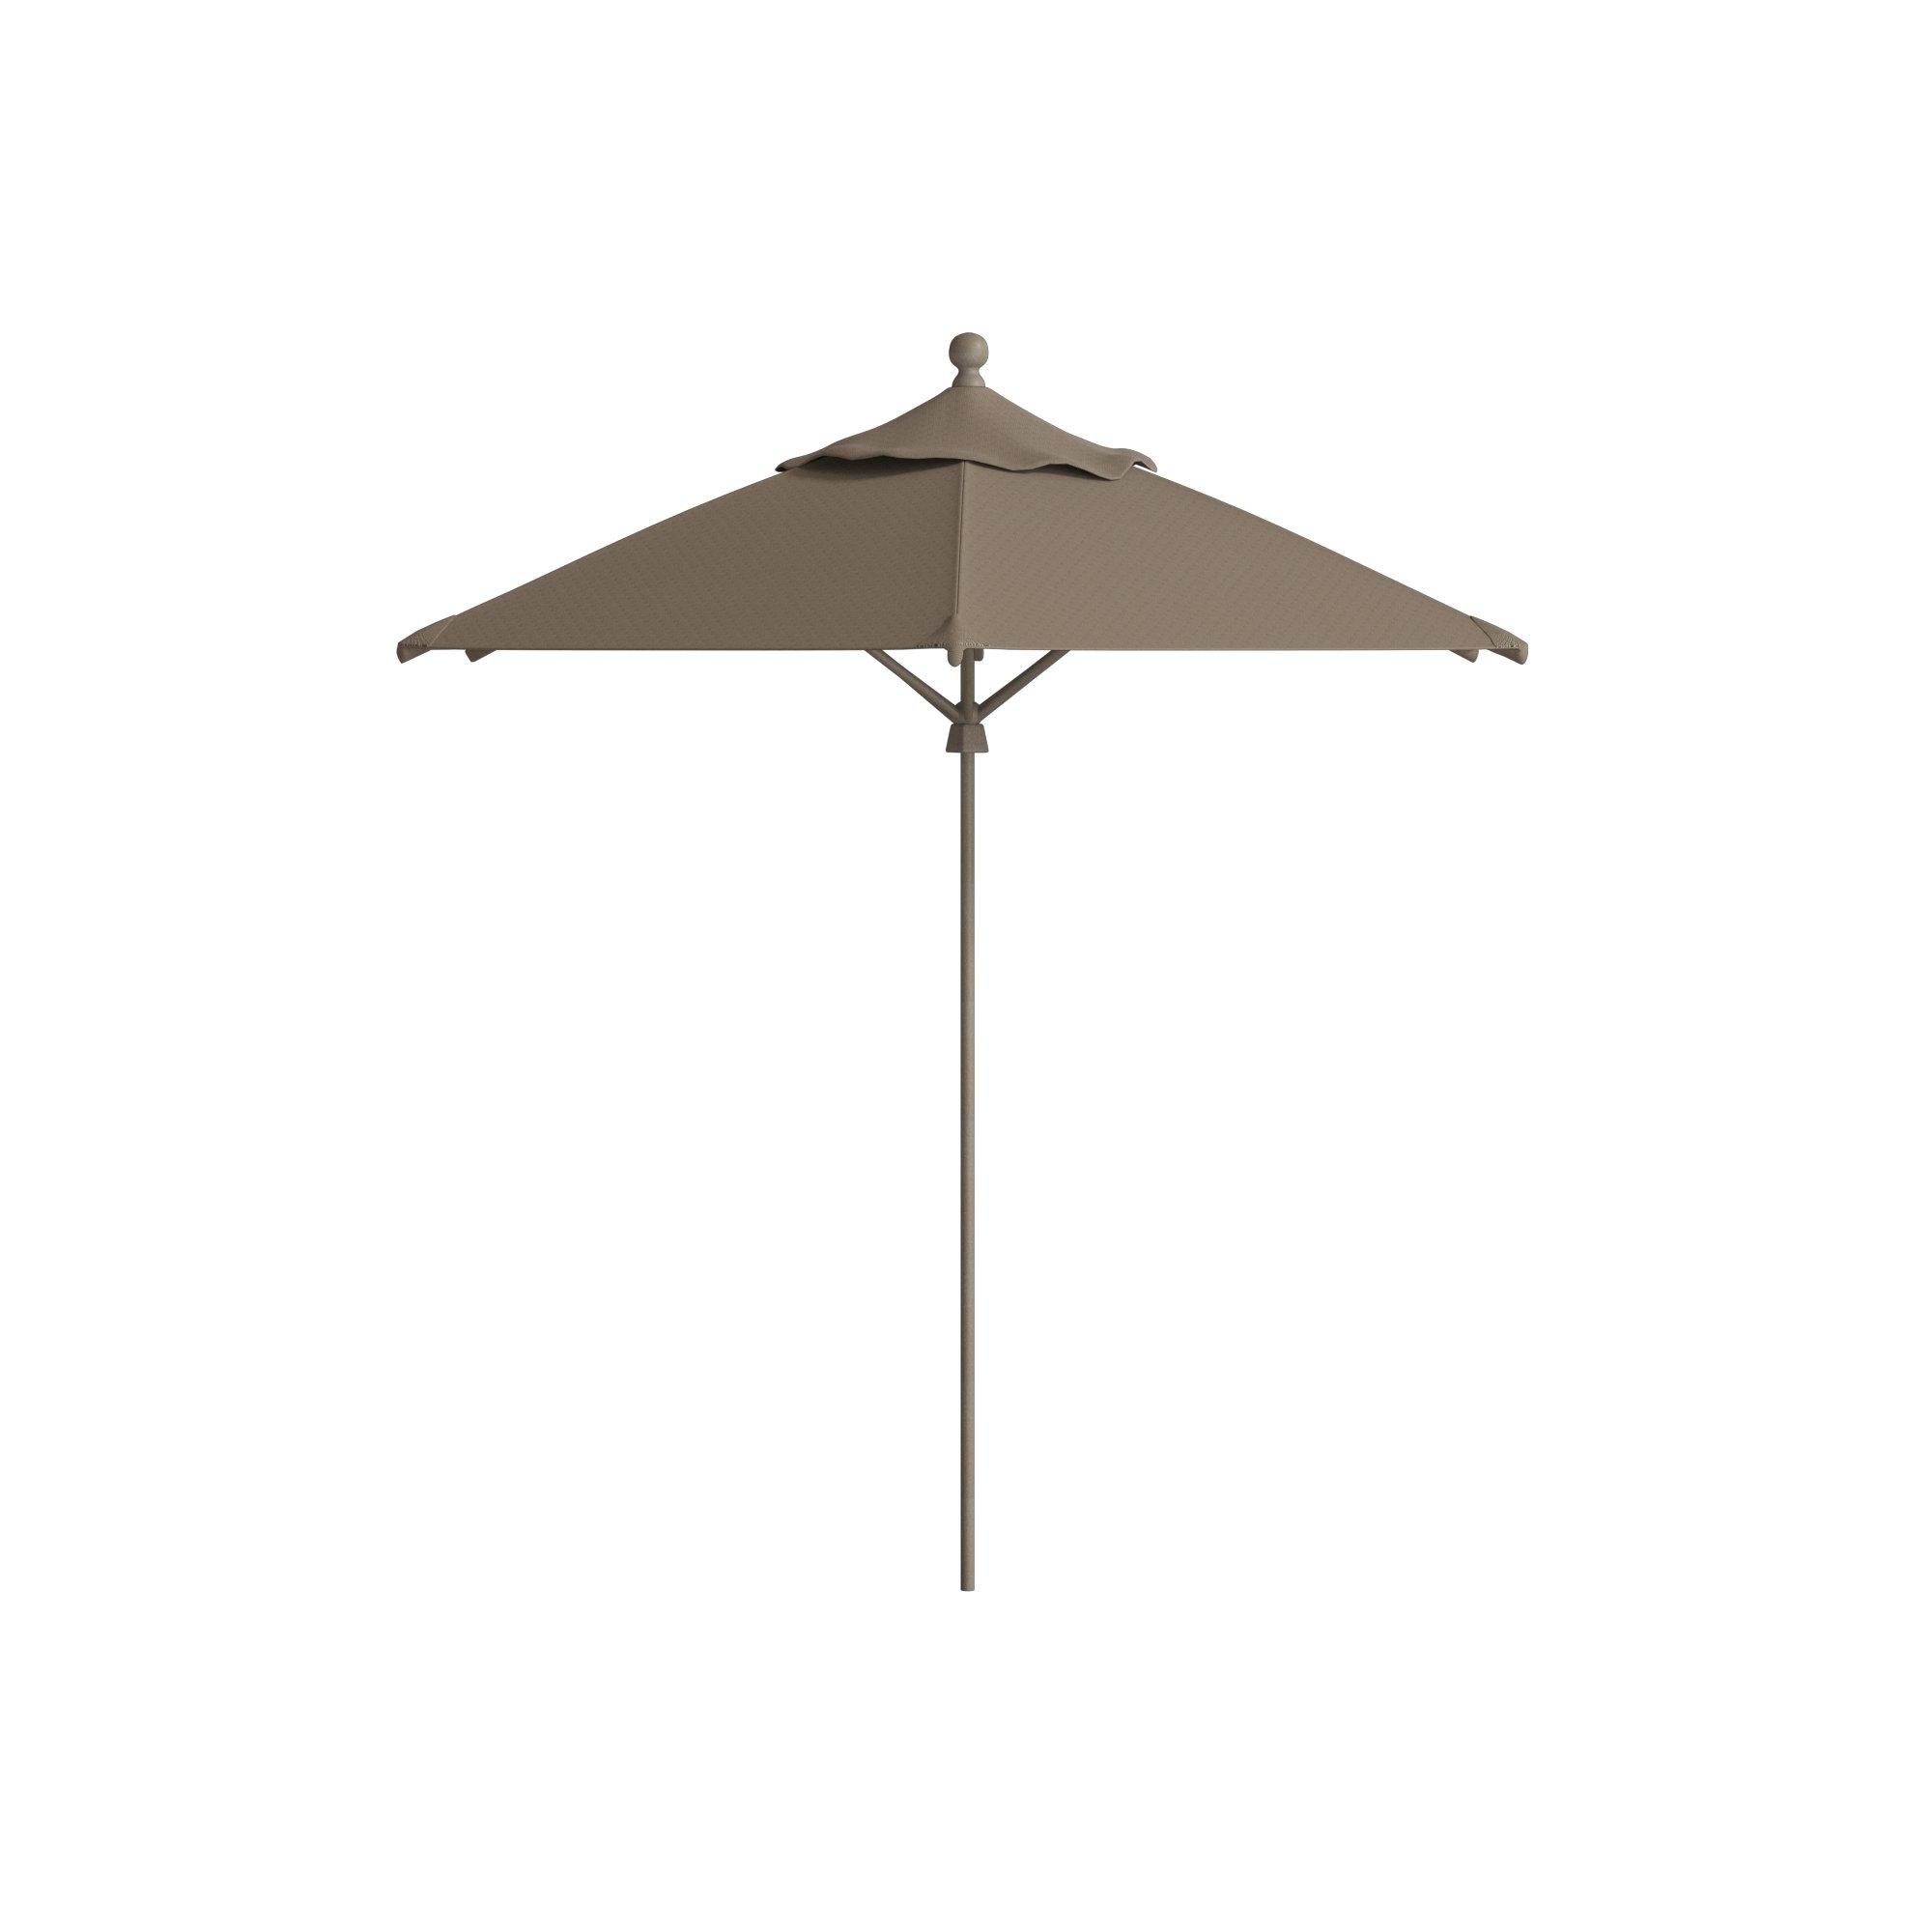 Portofino 8' Market Umbrella Pertaining To Widely Used Caravelle Market Umbrellas (View 15 of 20)